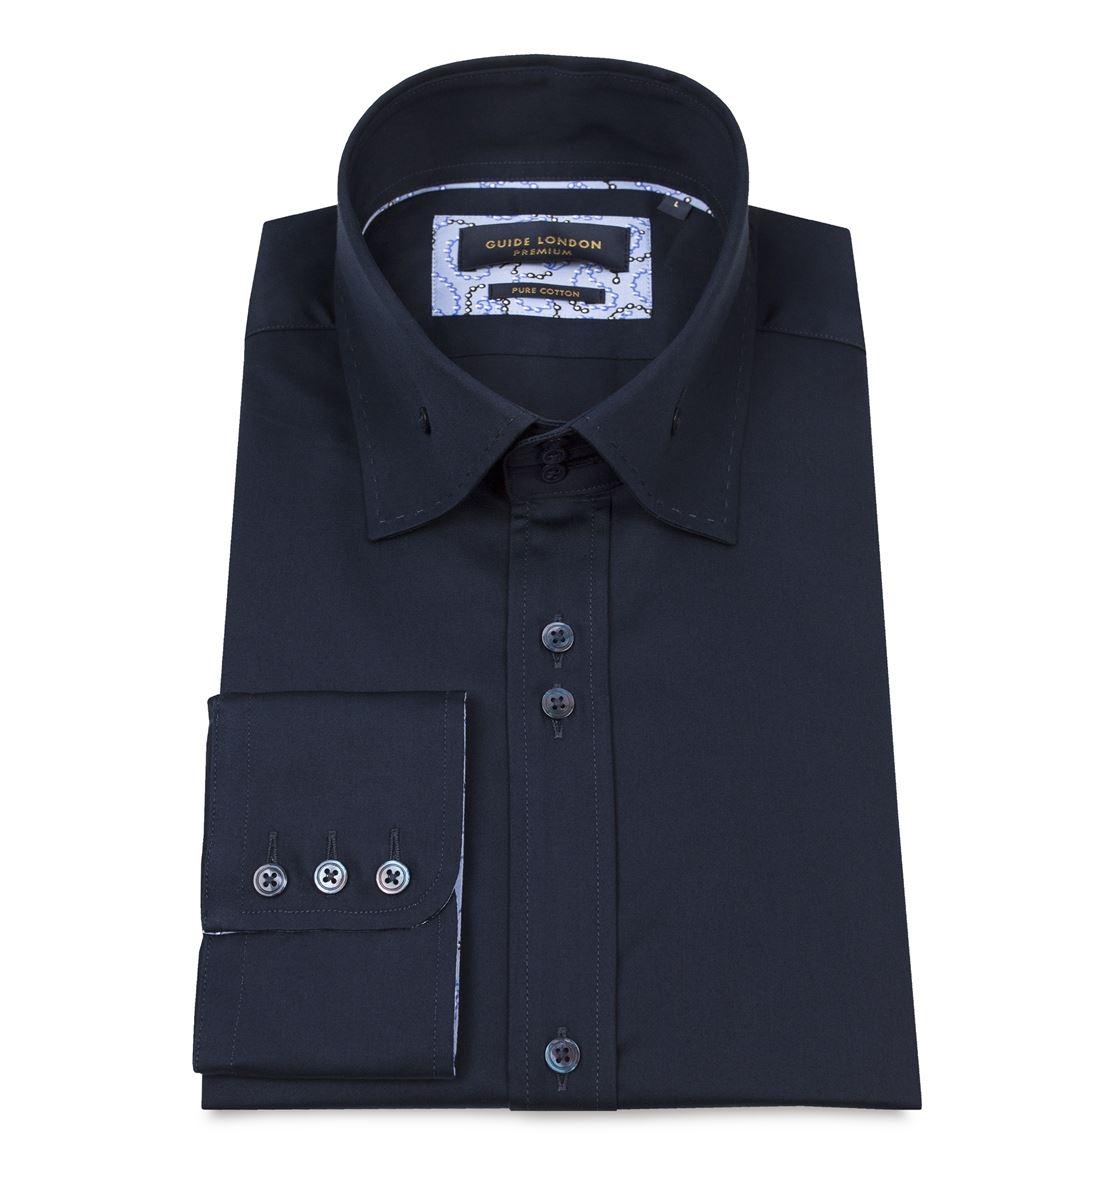 Guide London Mens Ls74587 Smart Cotton Sateen High Collar Slim Fit